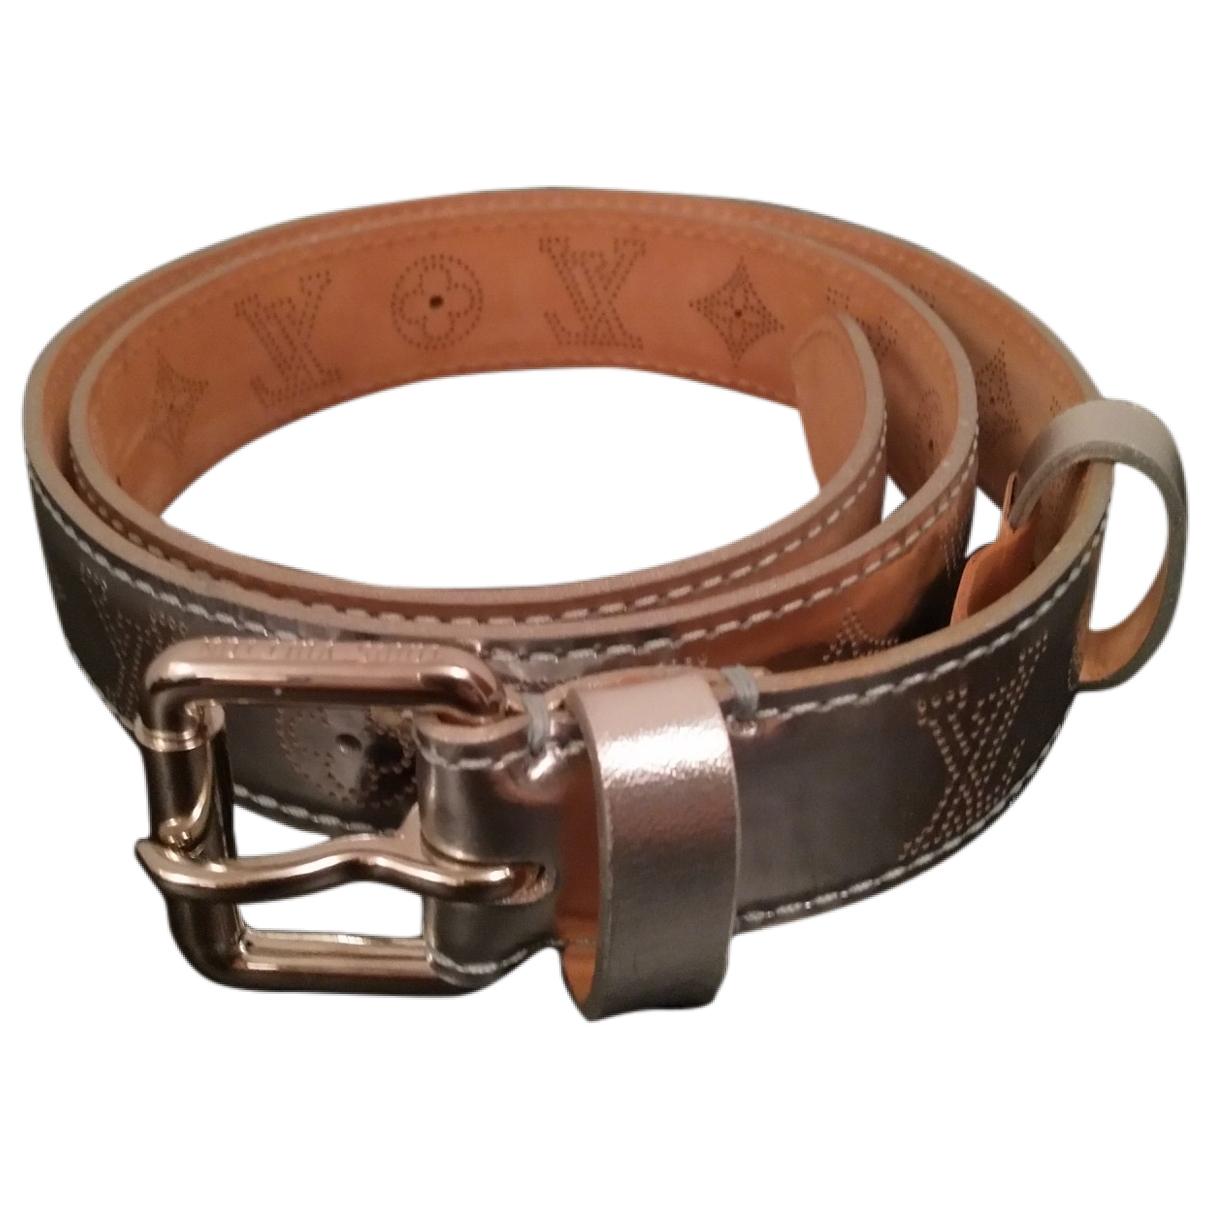 Louis Vuitton \N Silver Leather belt for Women 80 cm